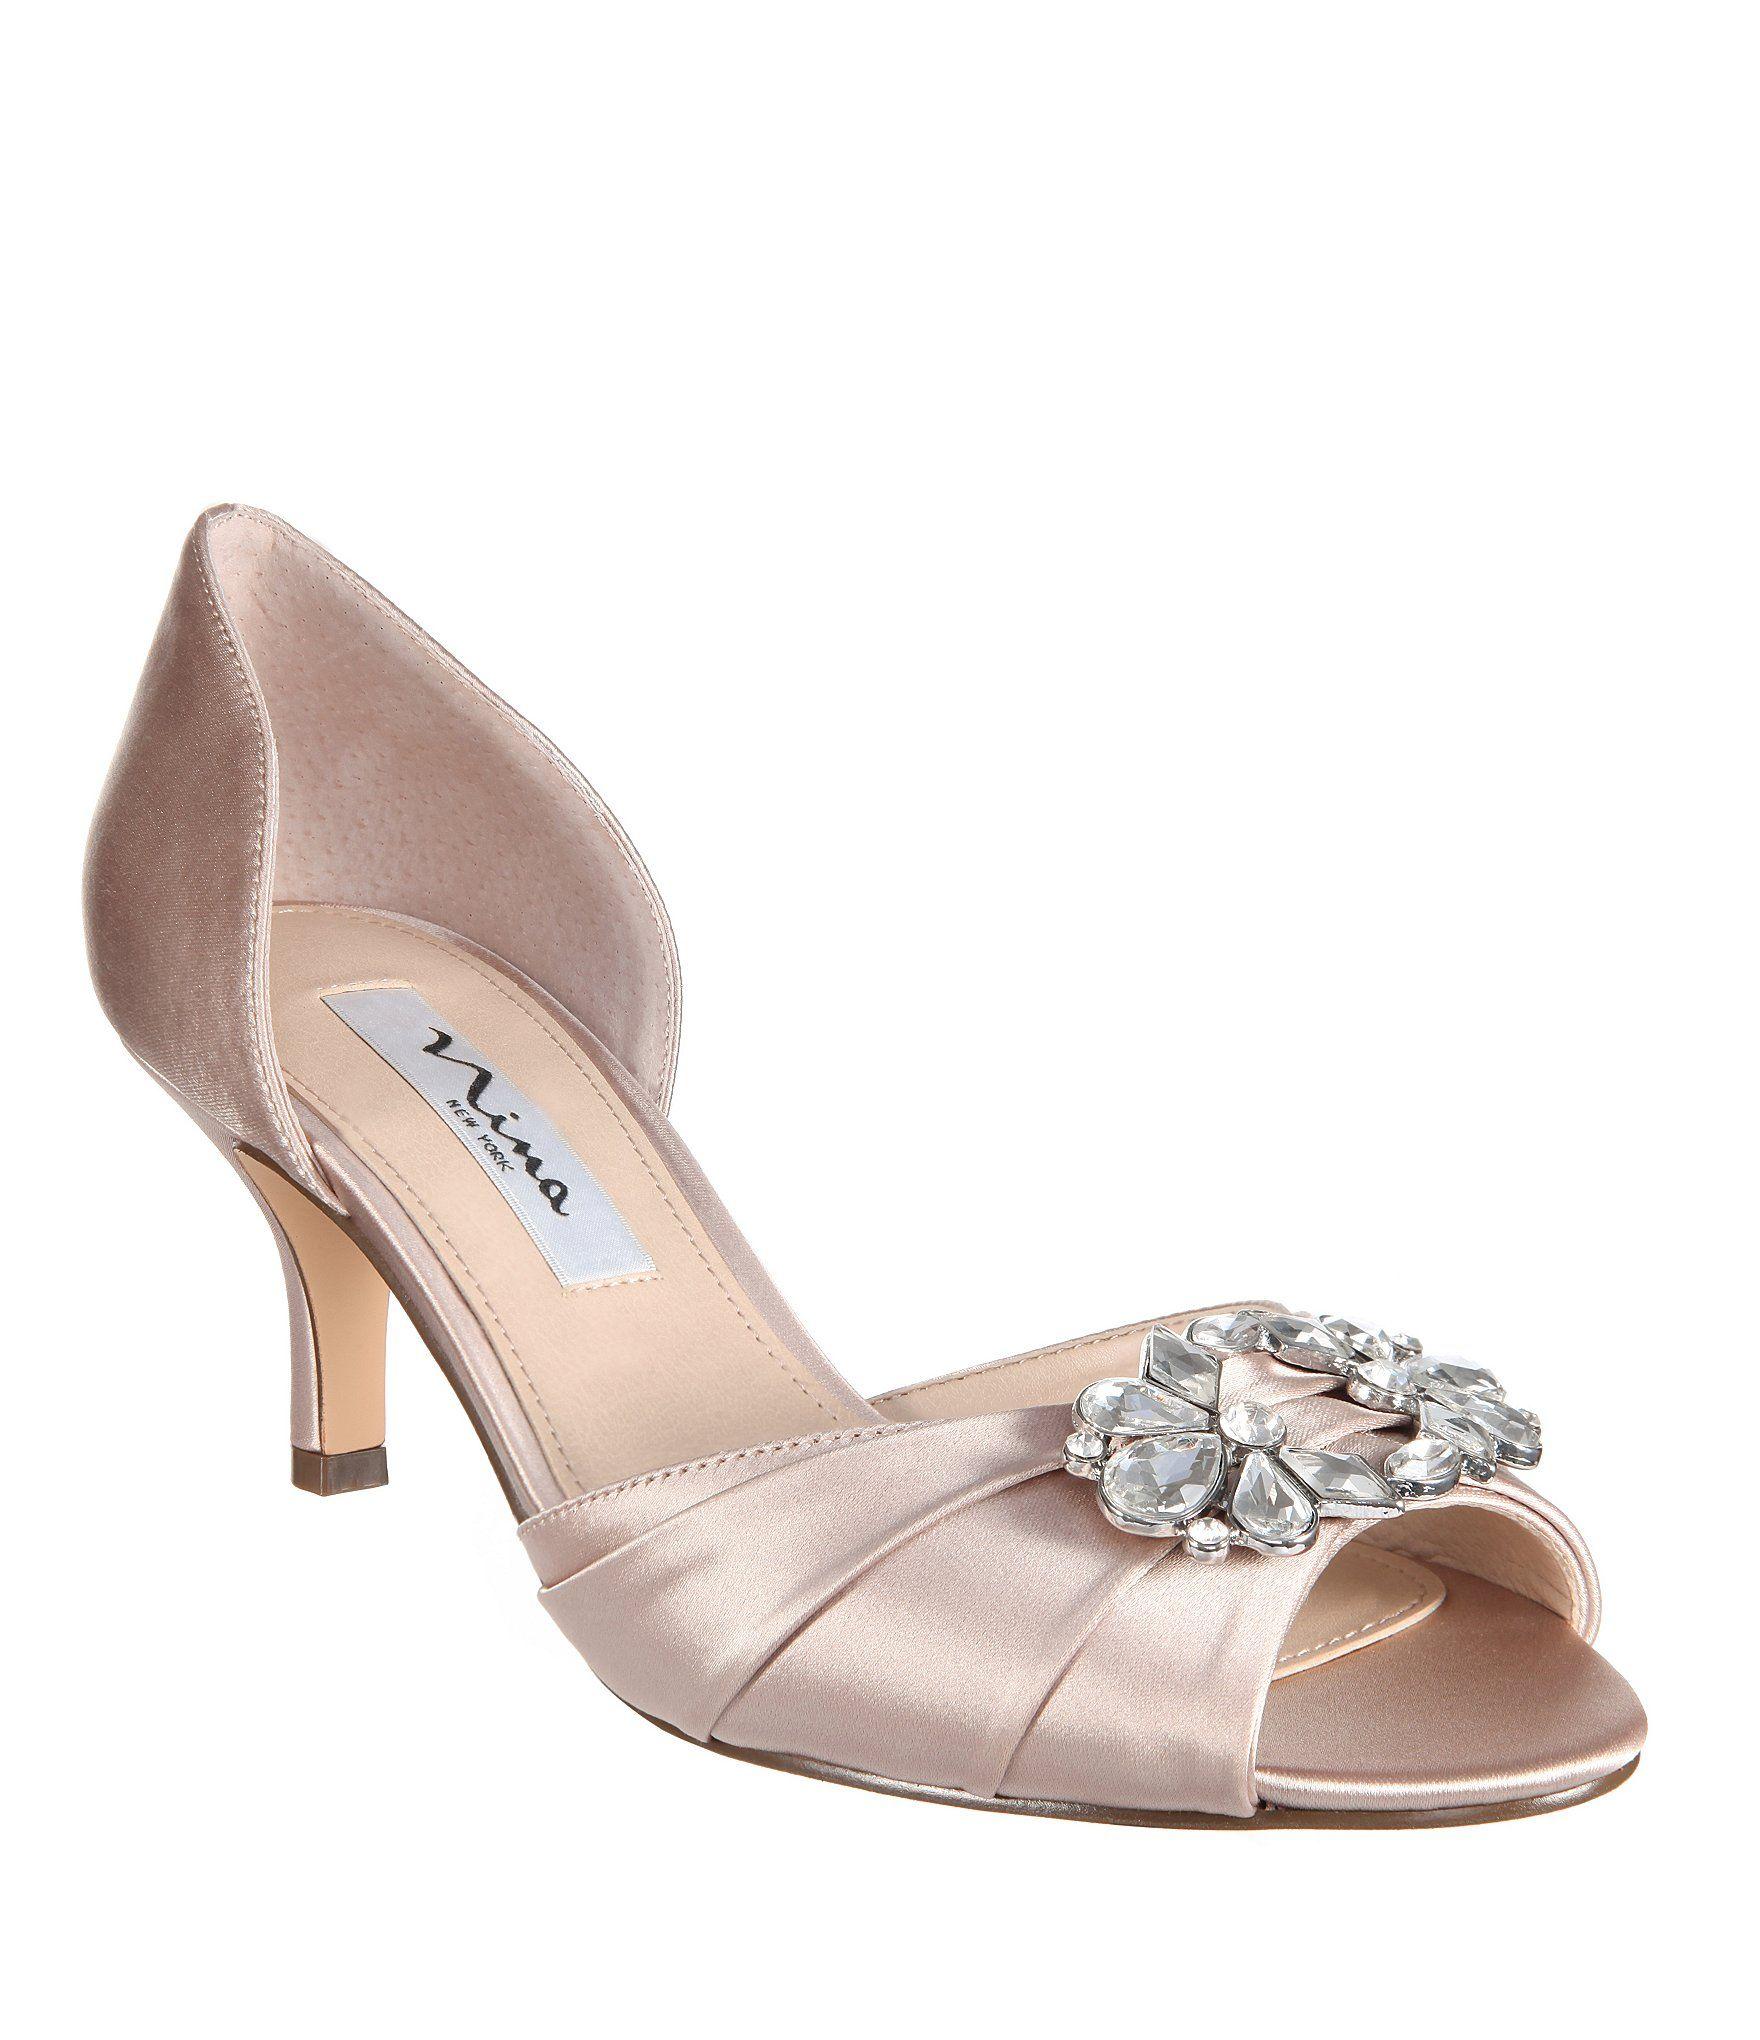 28804ebbd Nina Charisa Satin Crystal Brooch Peep-Toe d'Orsay Pumps | Dress ...